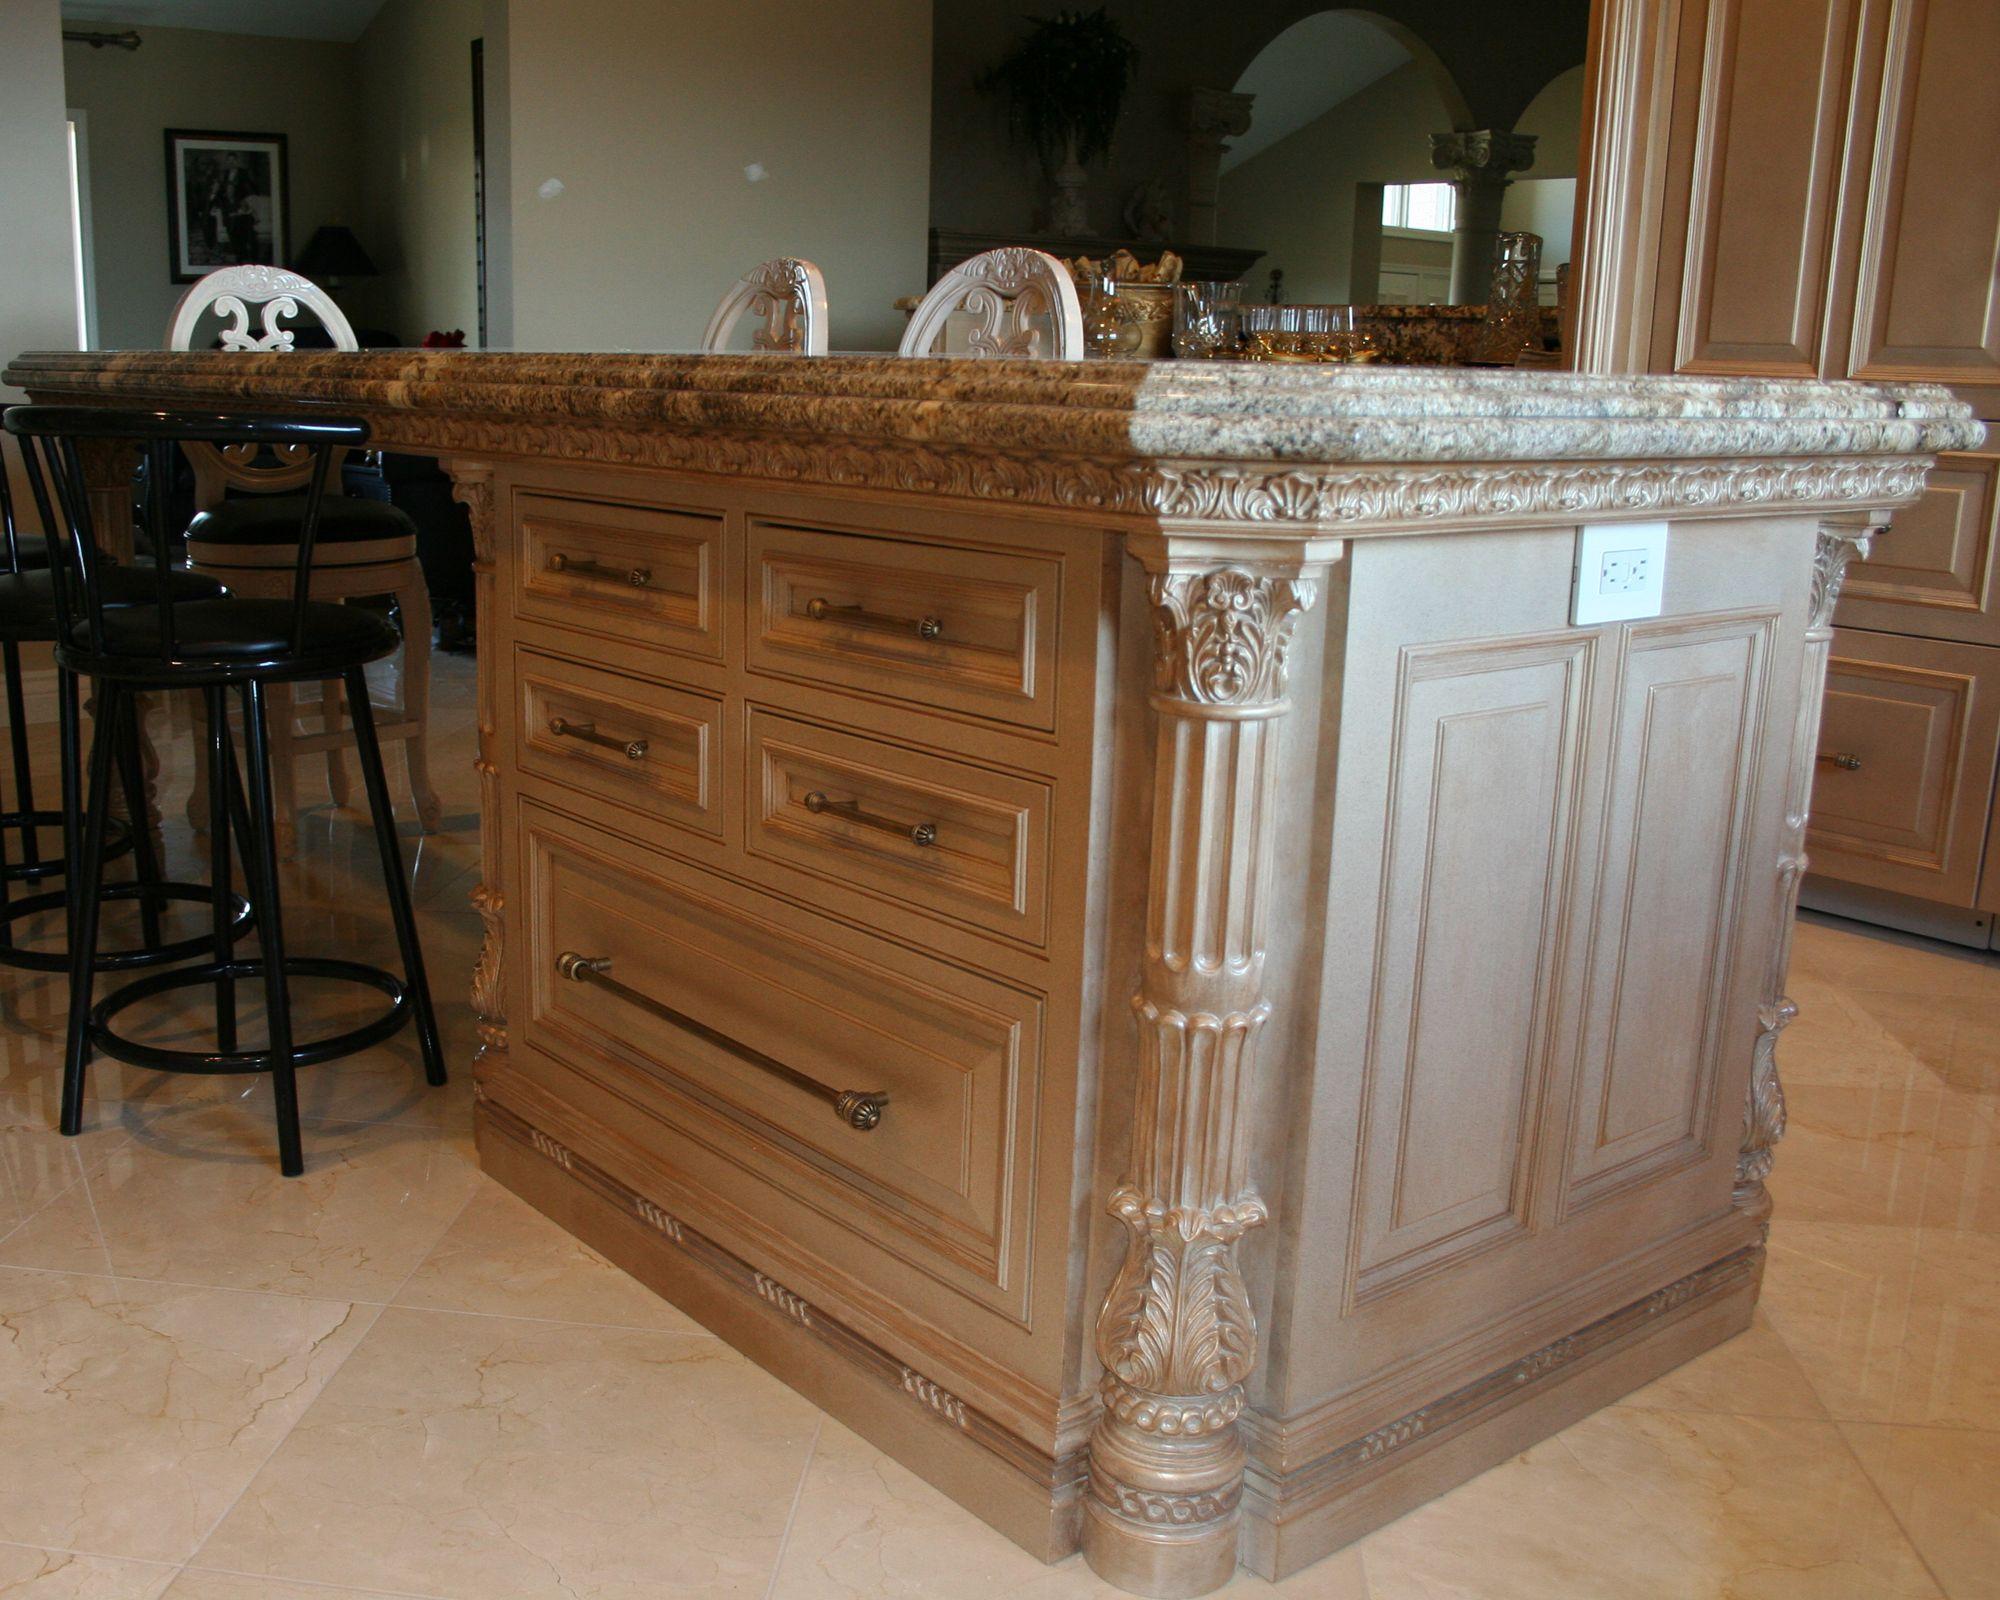 ornate kitchen cabinets | Island Cabinet | Lantz Custom Woodworking ...